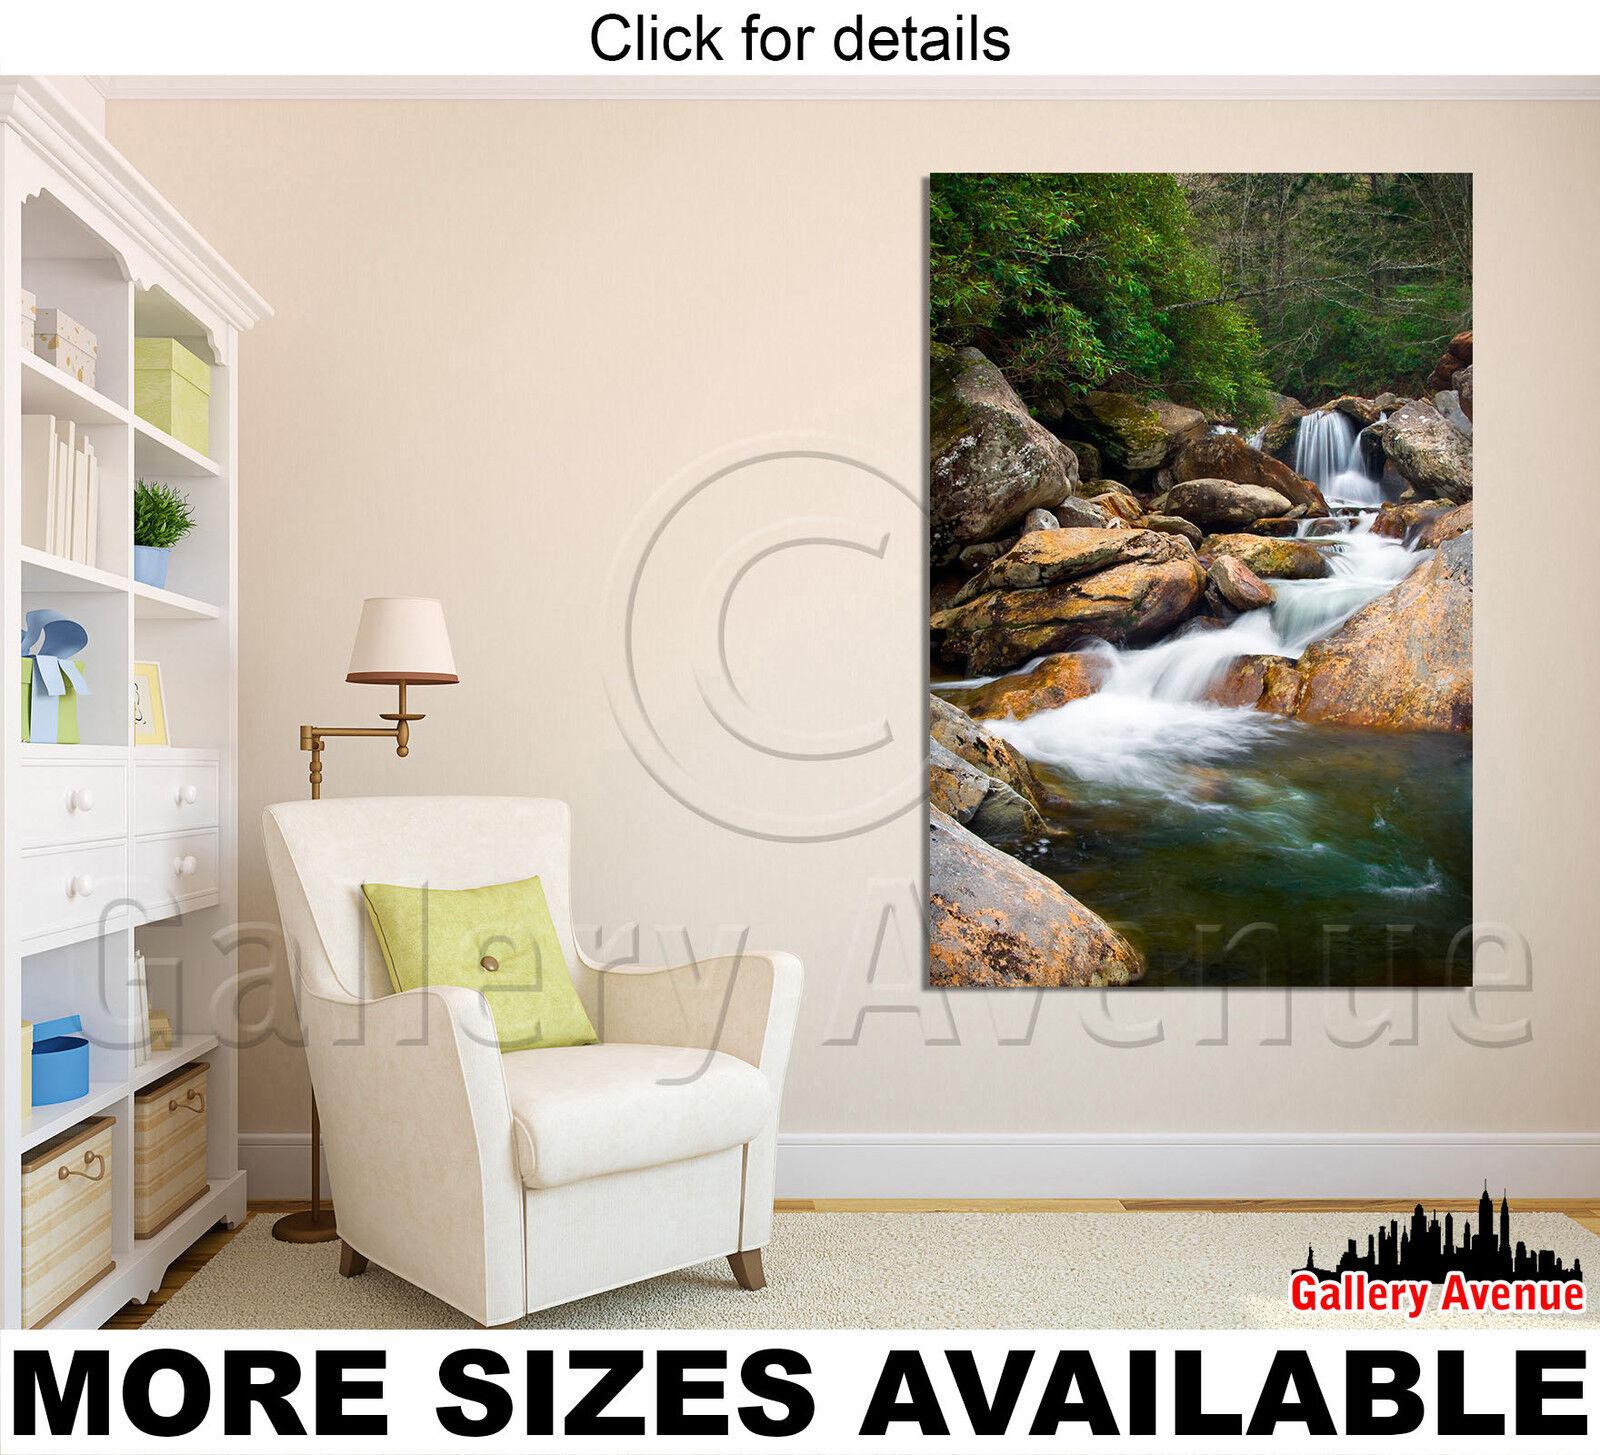 wand kunst Canvas Picture drucken - Blaurrot Waterfalls Landscape in Blau Ridge 2.3